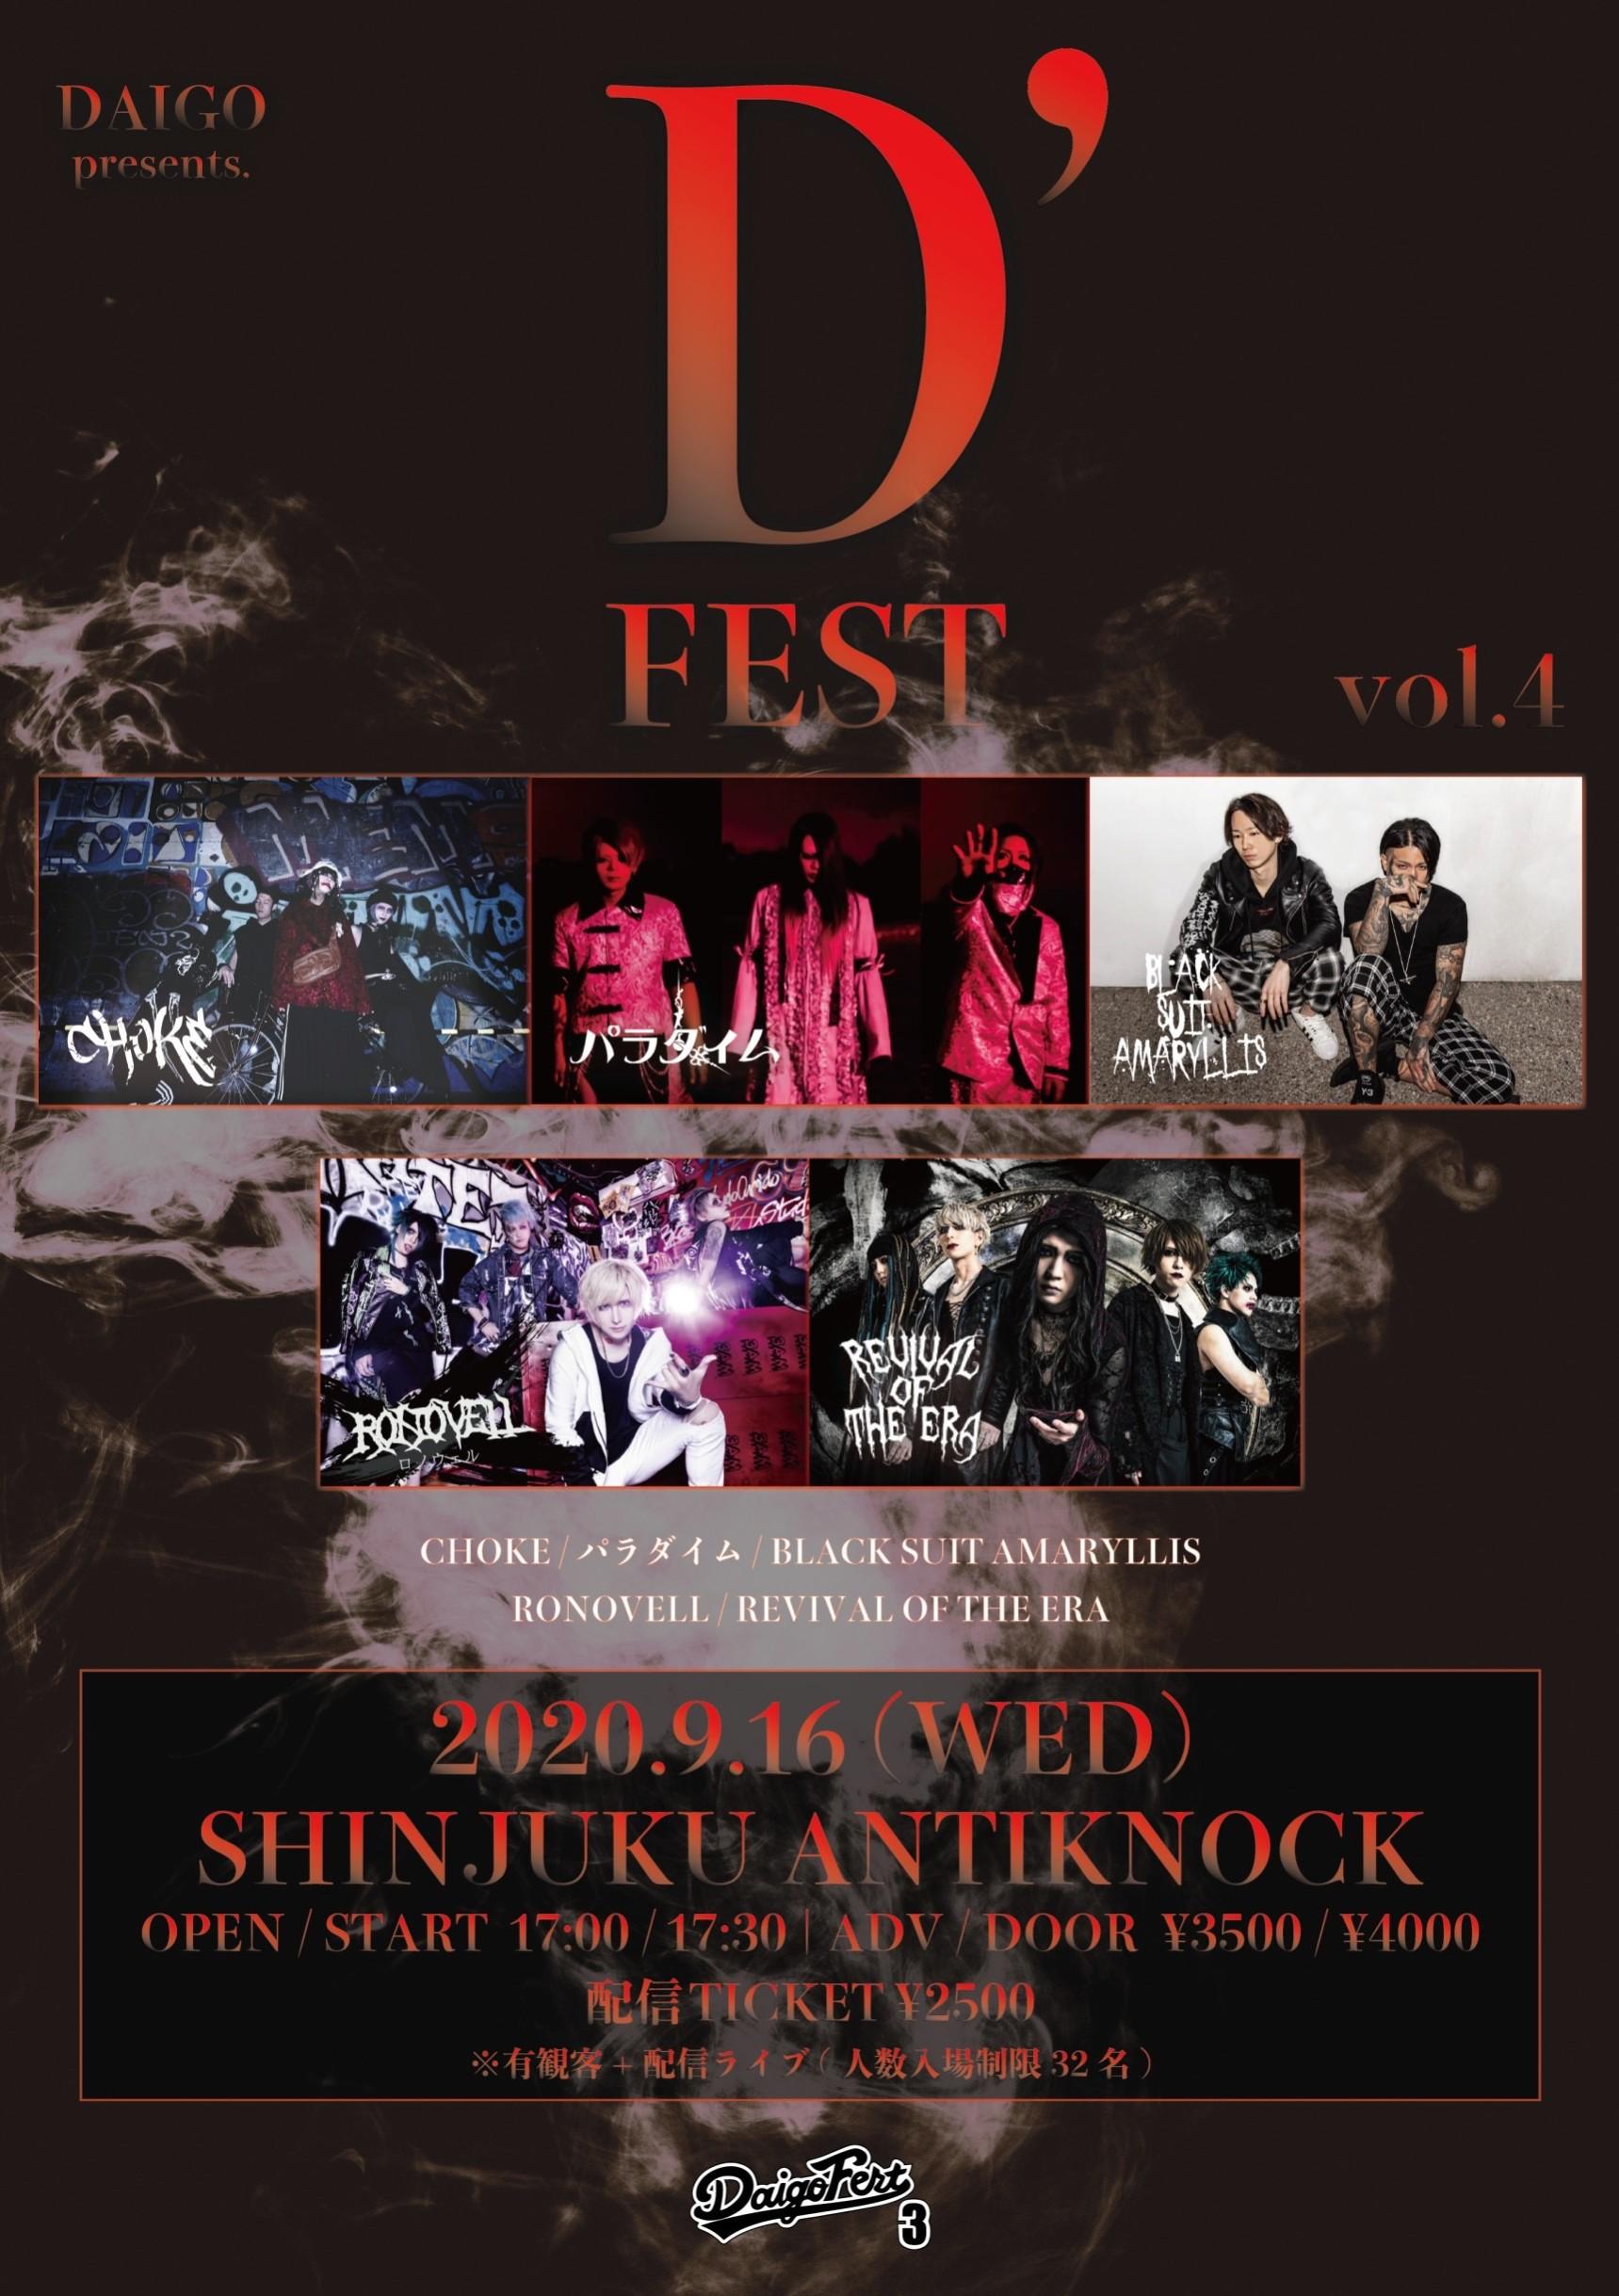 DAIGO presents 【D'FEST vol.4】